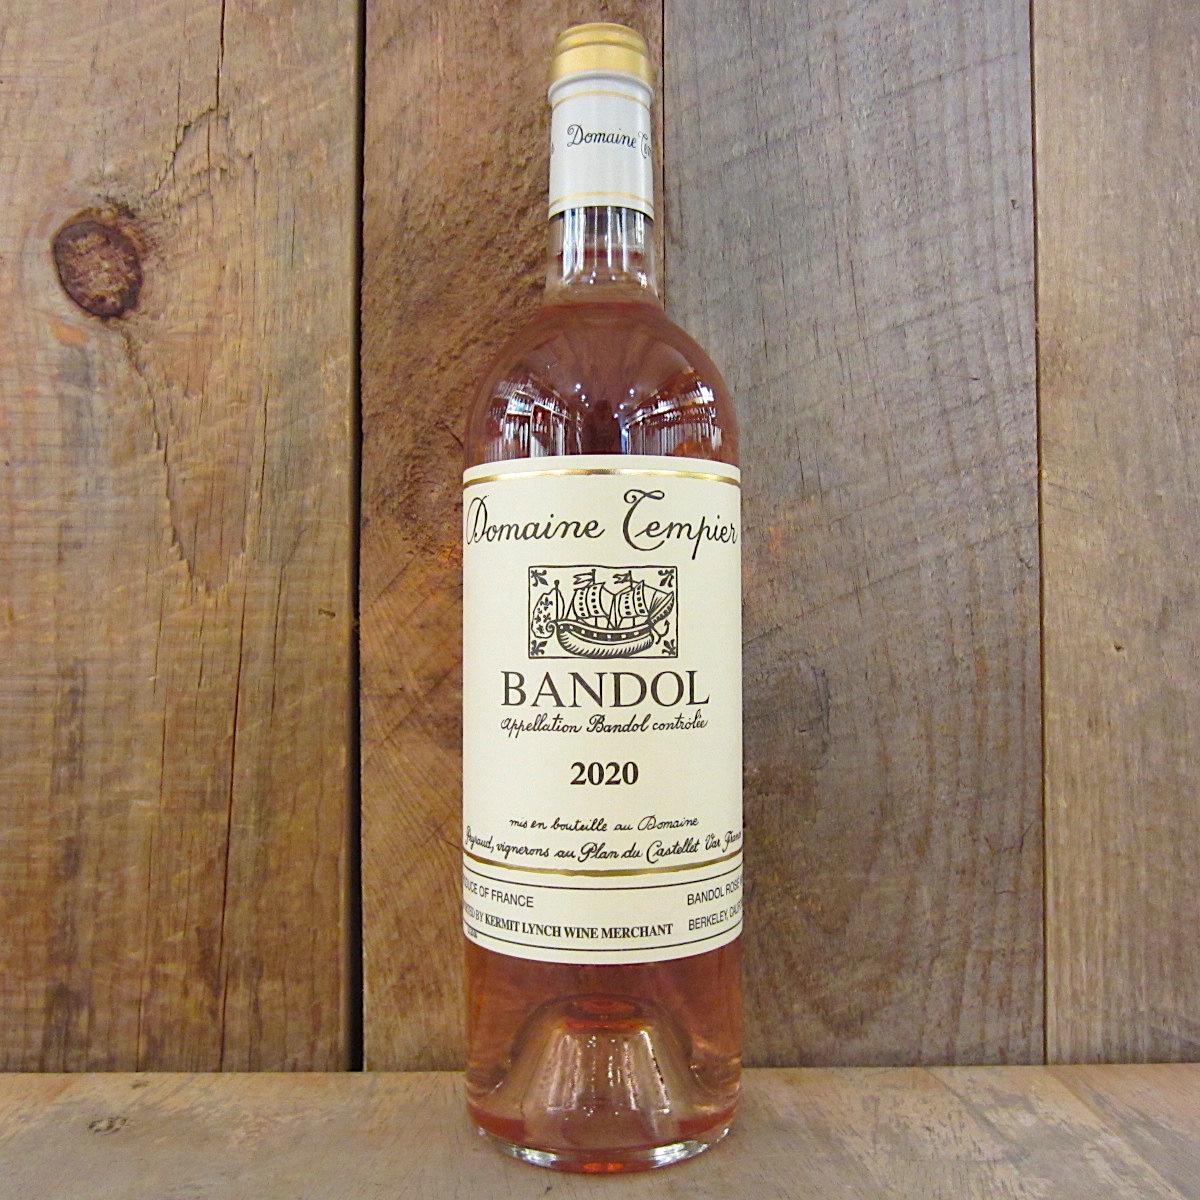 Domaine Tempier Bandol Rose 2020 750ml